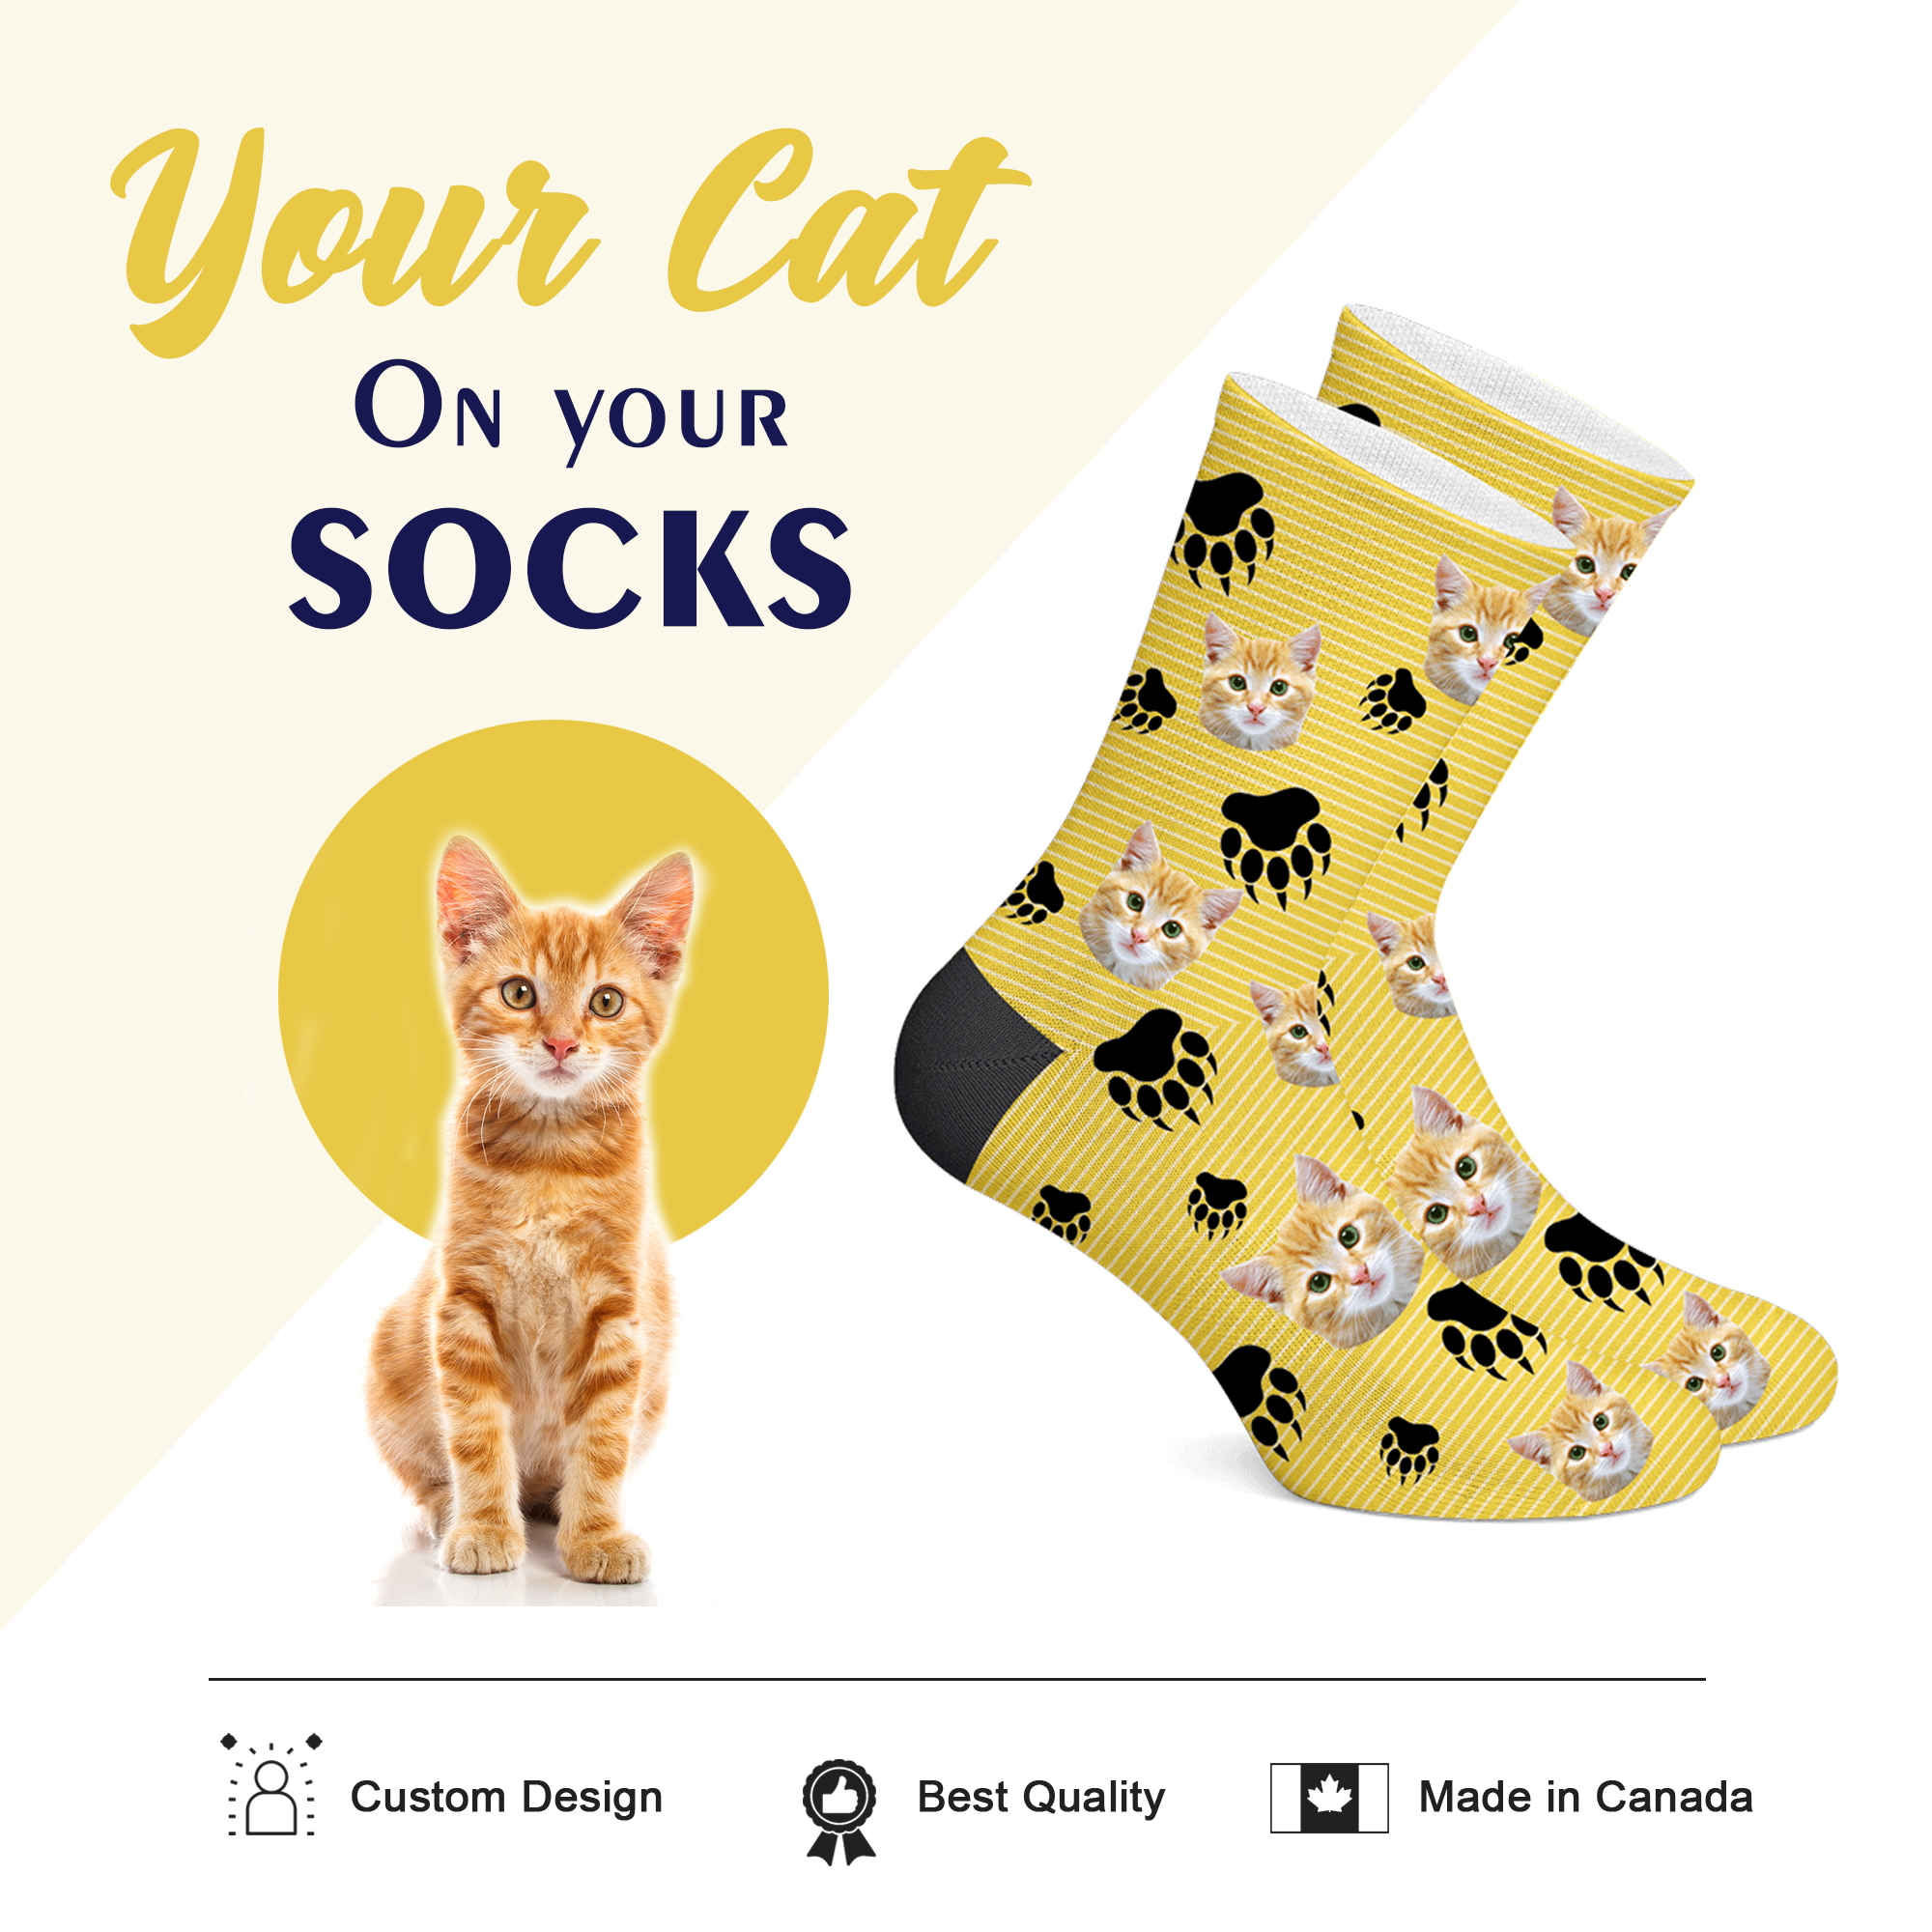 Customizable Cat Socks - PRINT CAT ON YOUR SOCKS